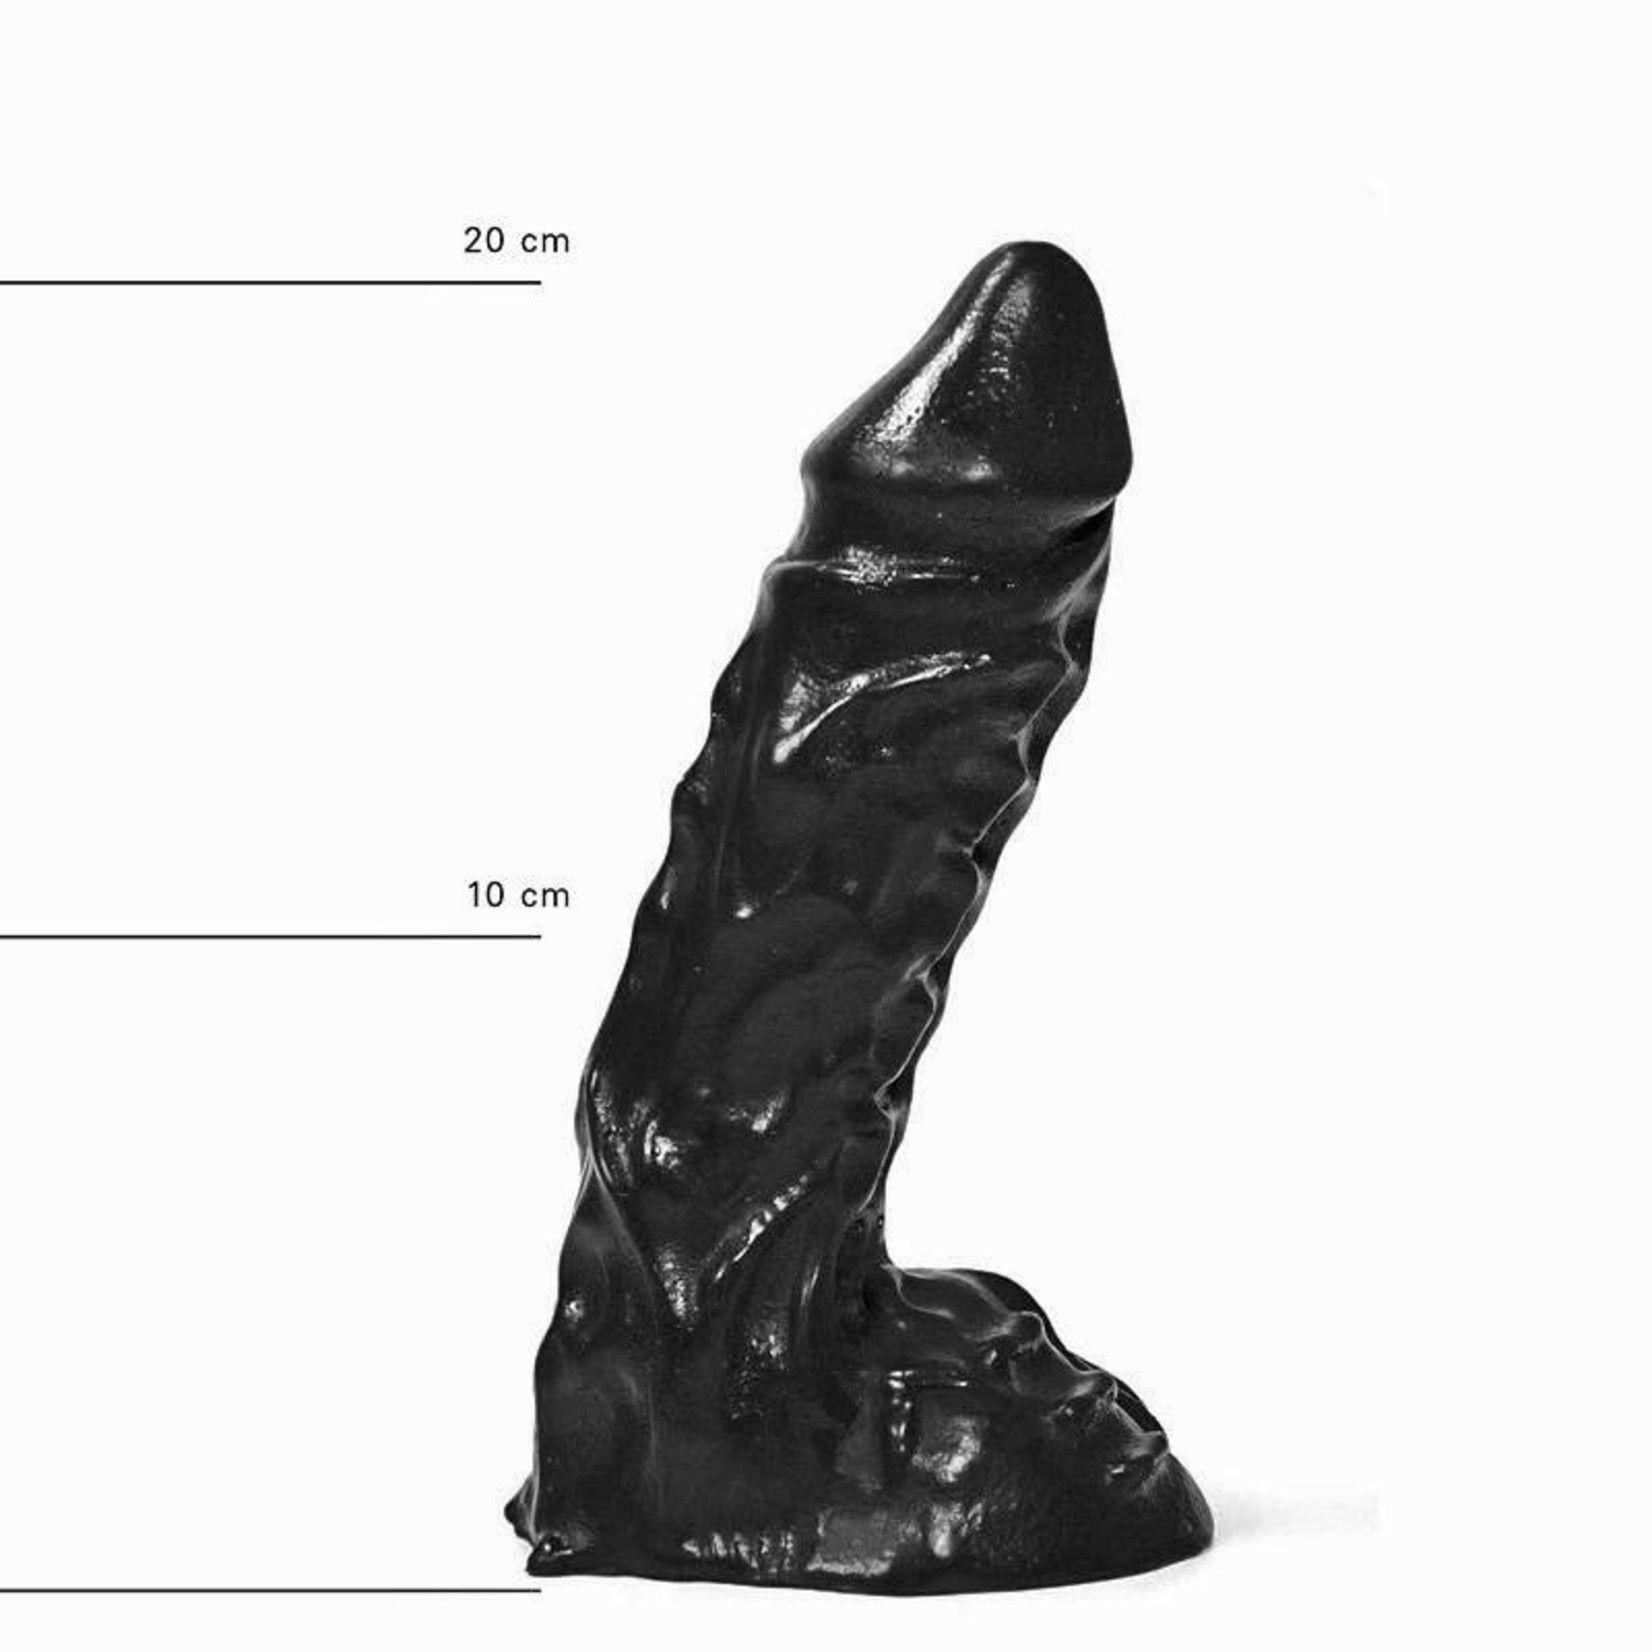 All Black All Black Dildo - AB 27